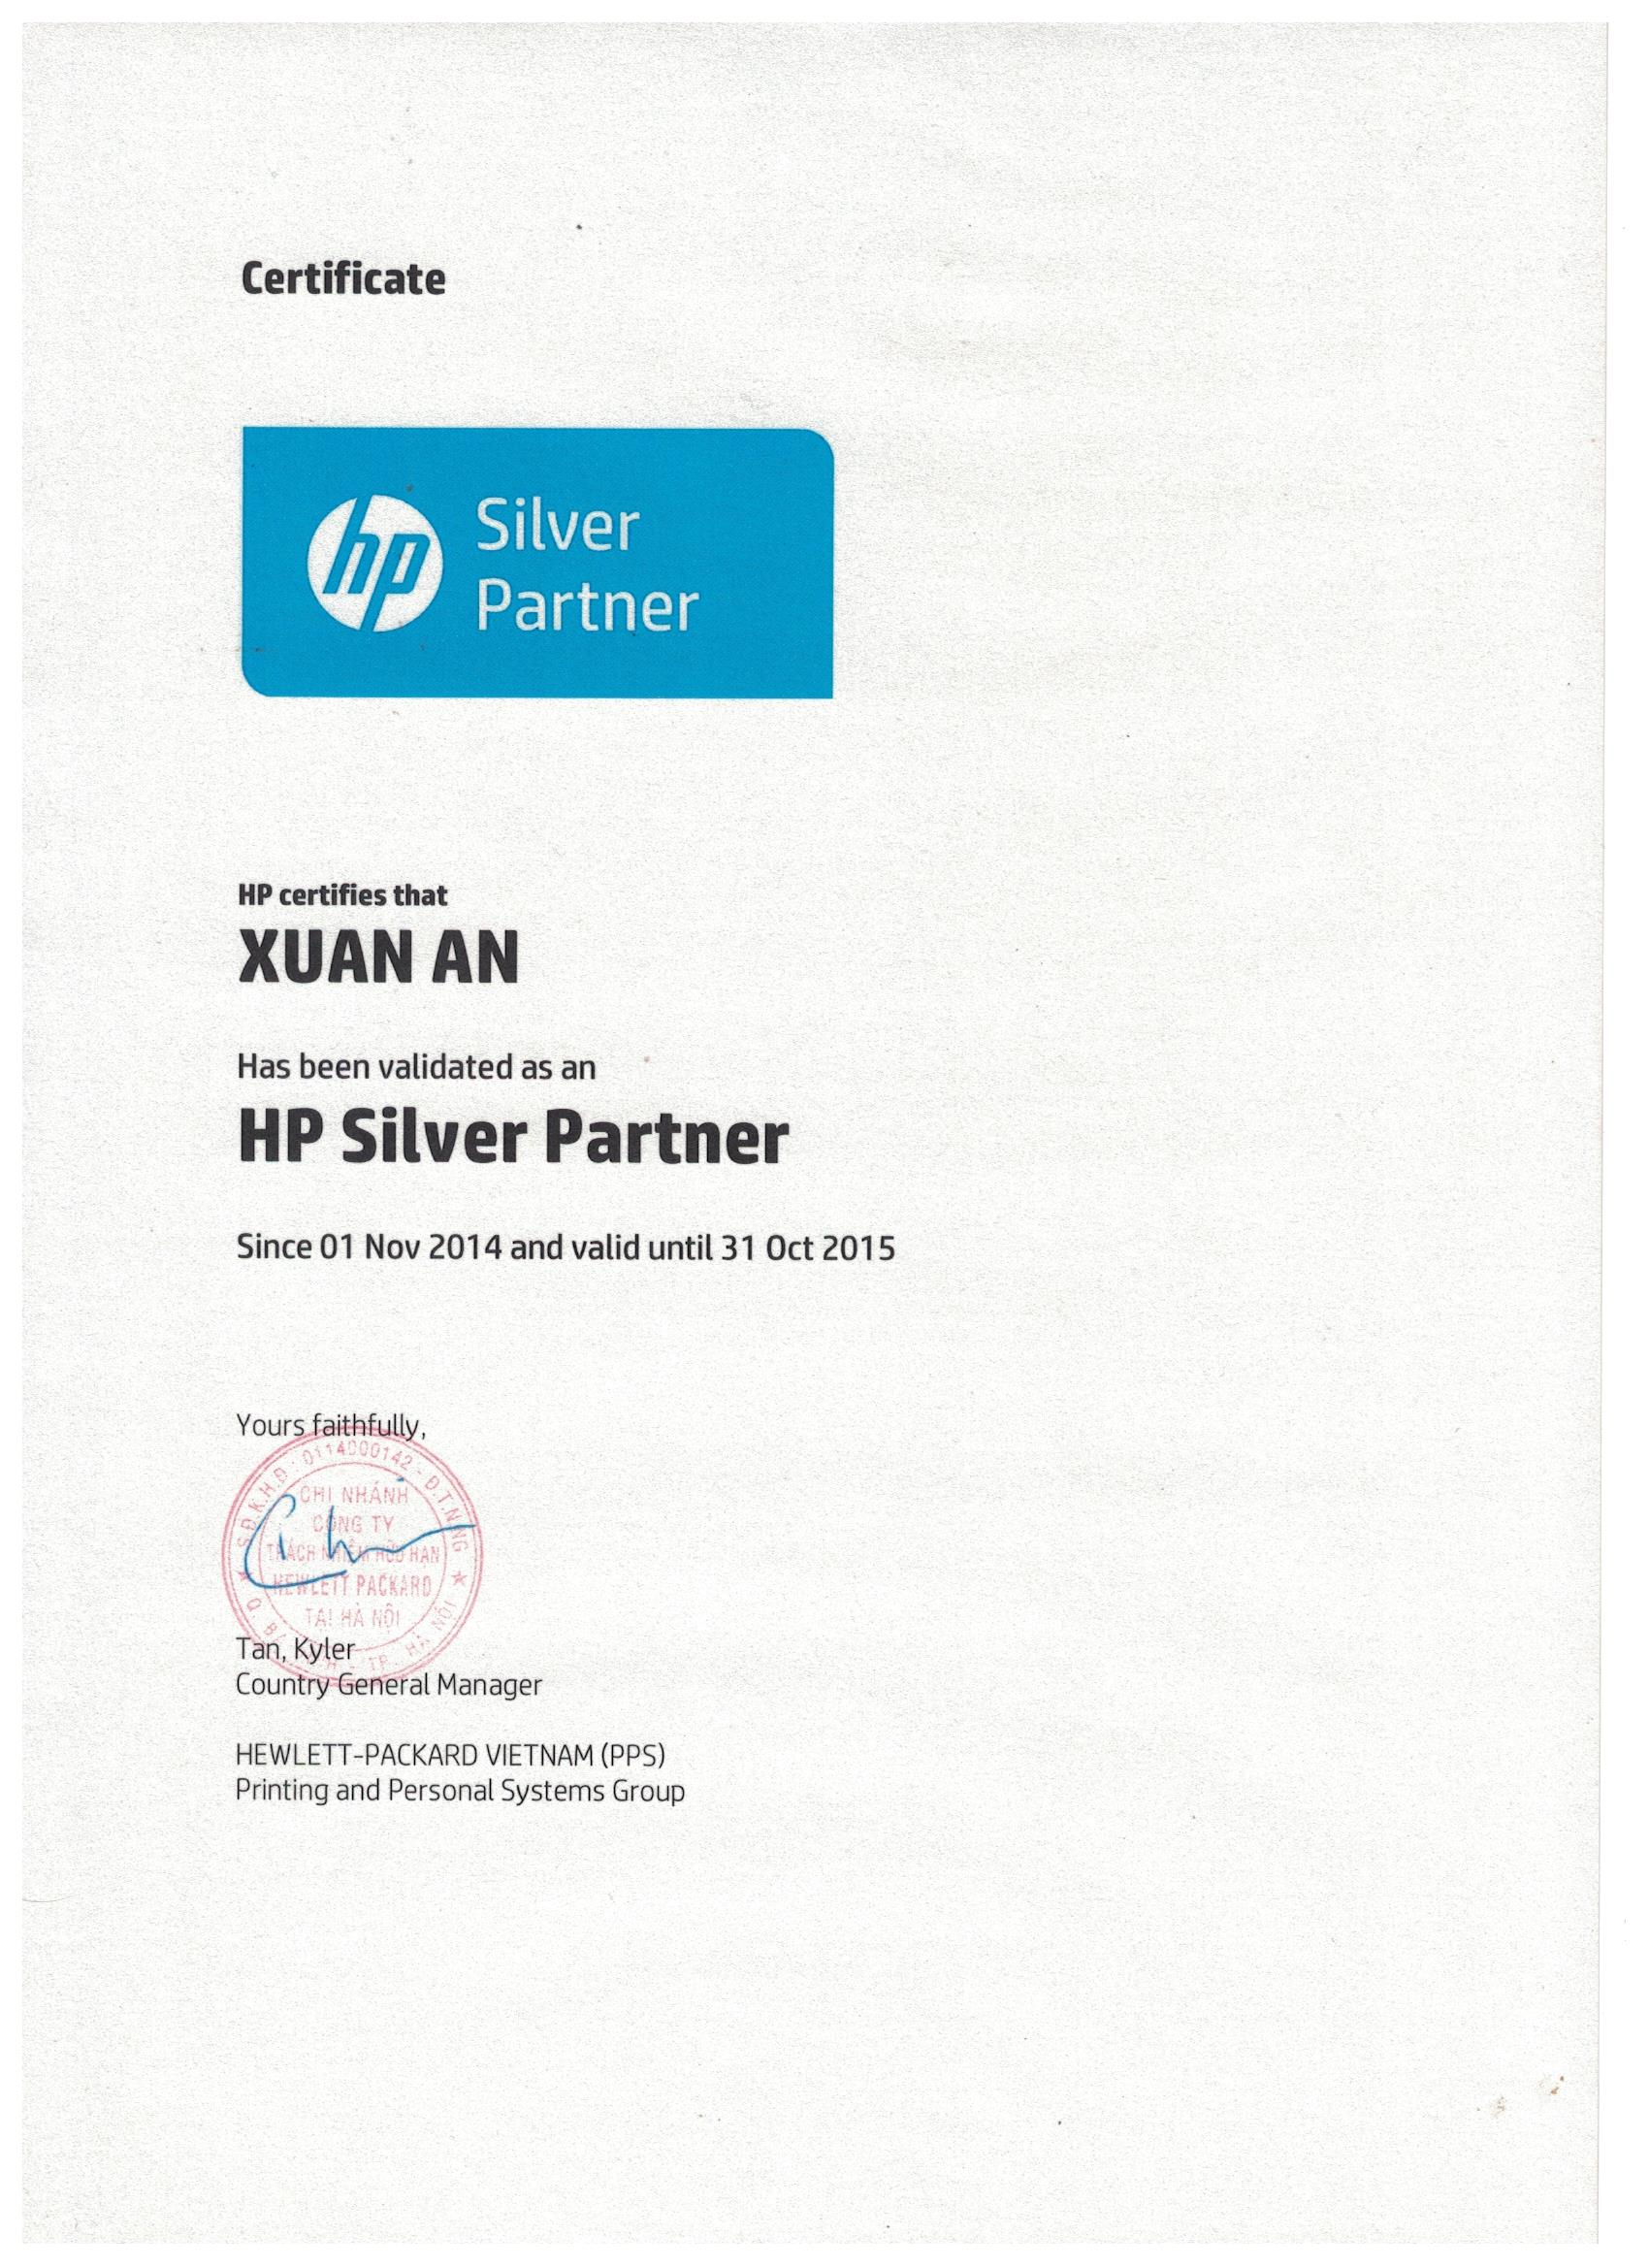 HP Probook 450 G4 - Z6T30PA (Silver)